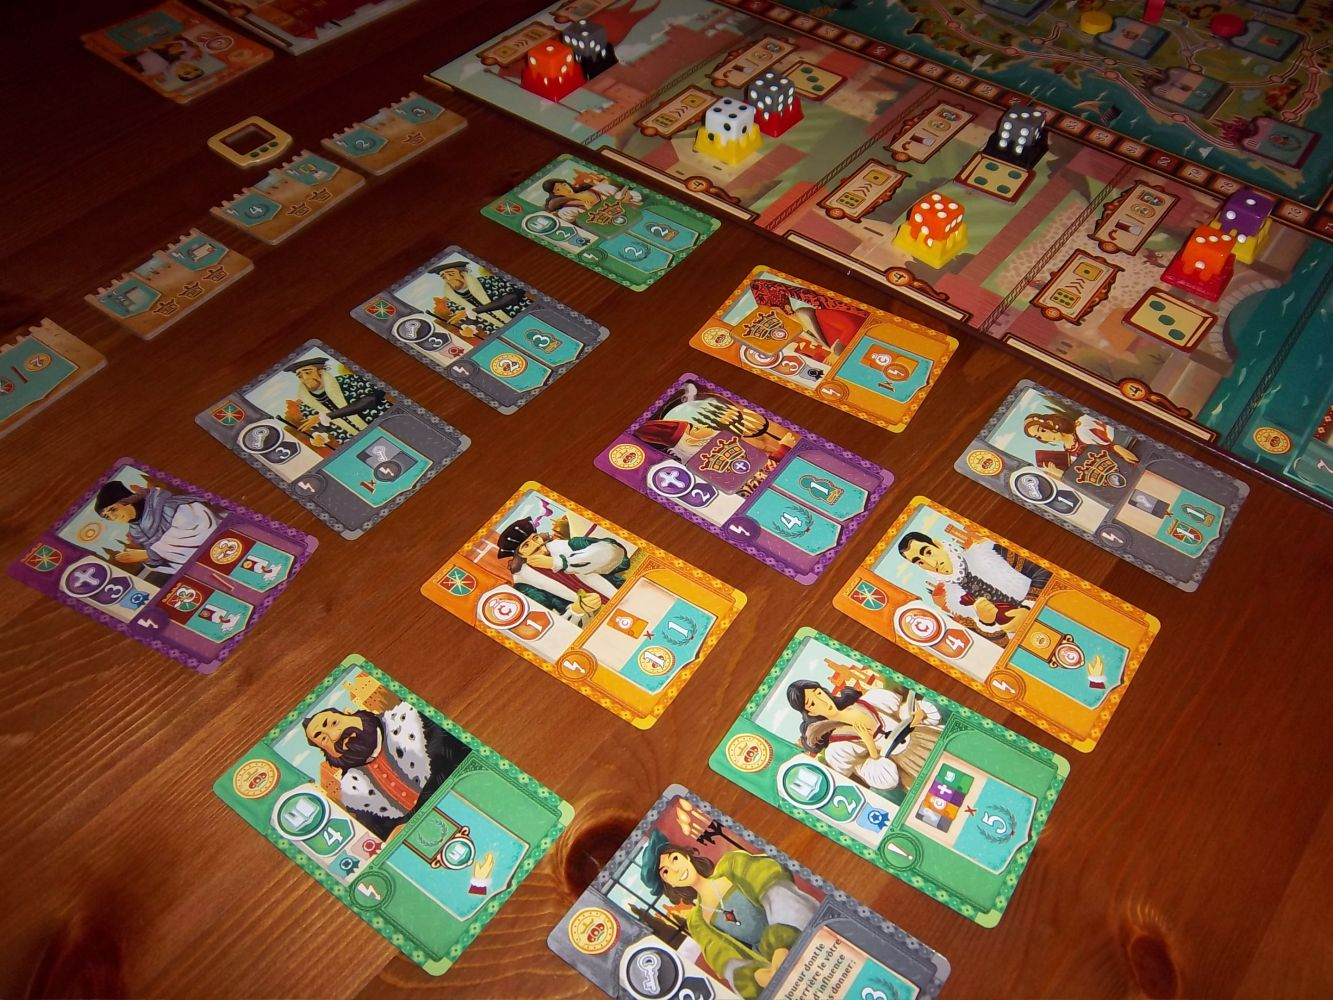 Un aperçu de quelques cartes en jeu durant une manche...